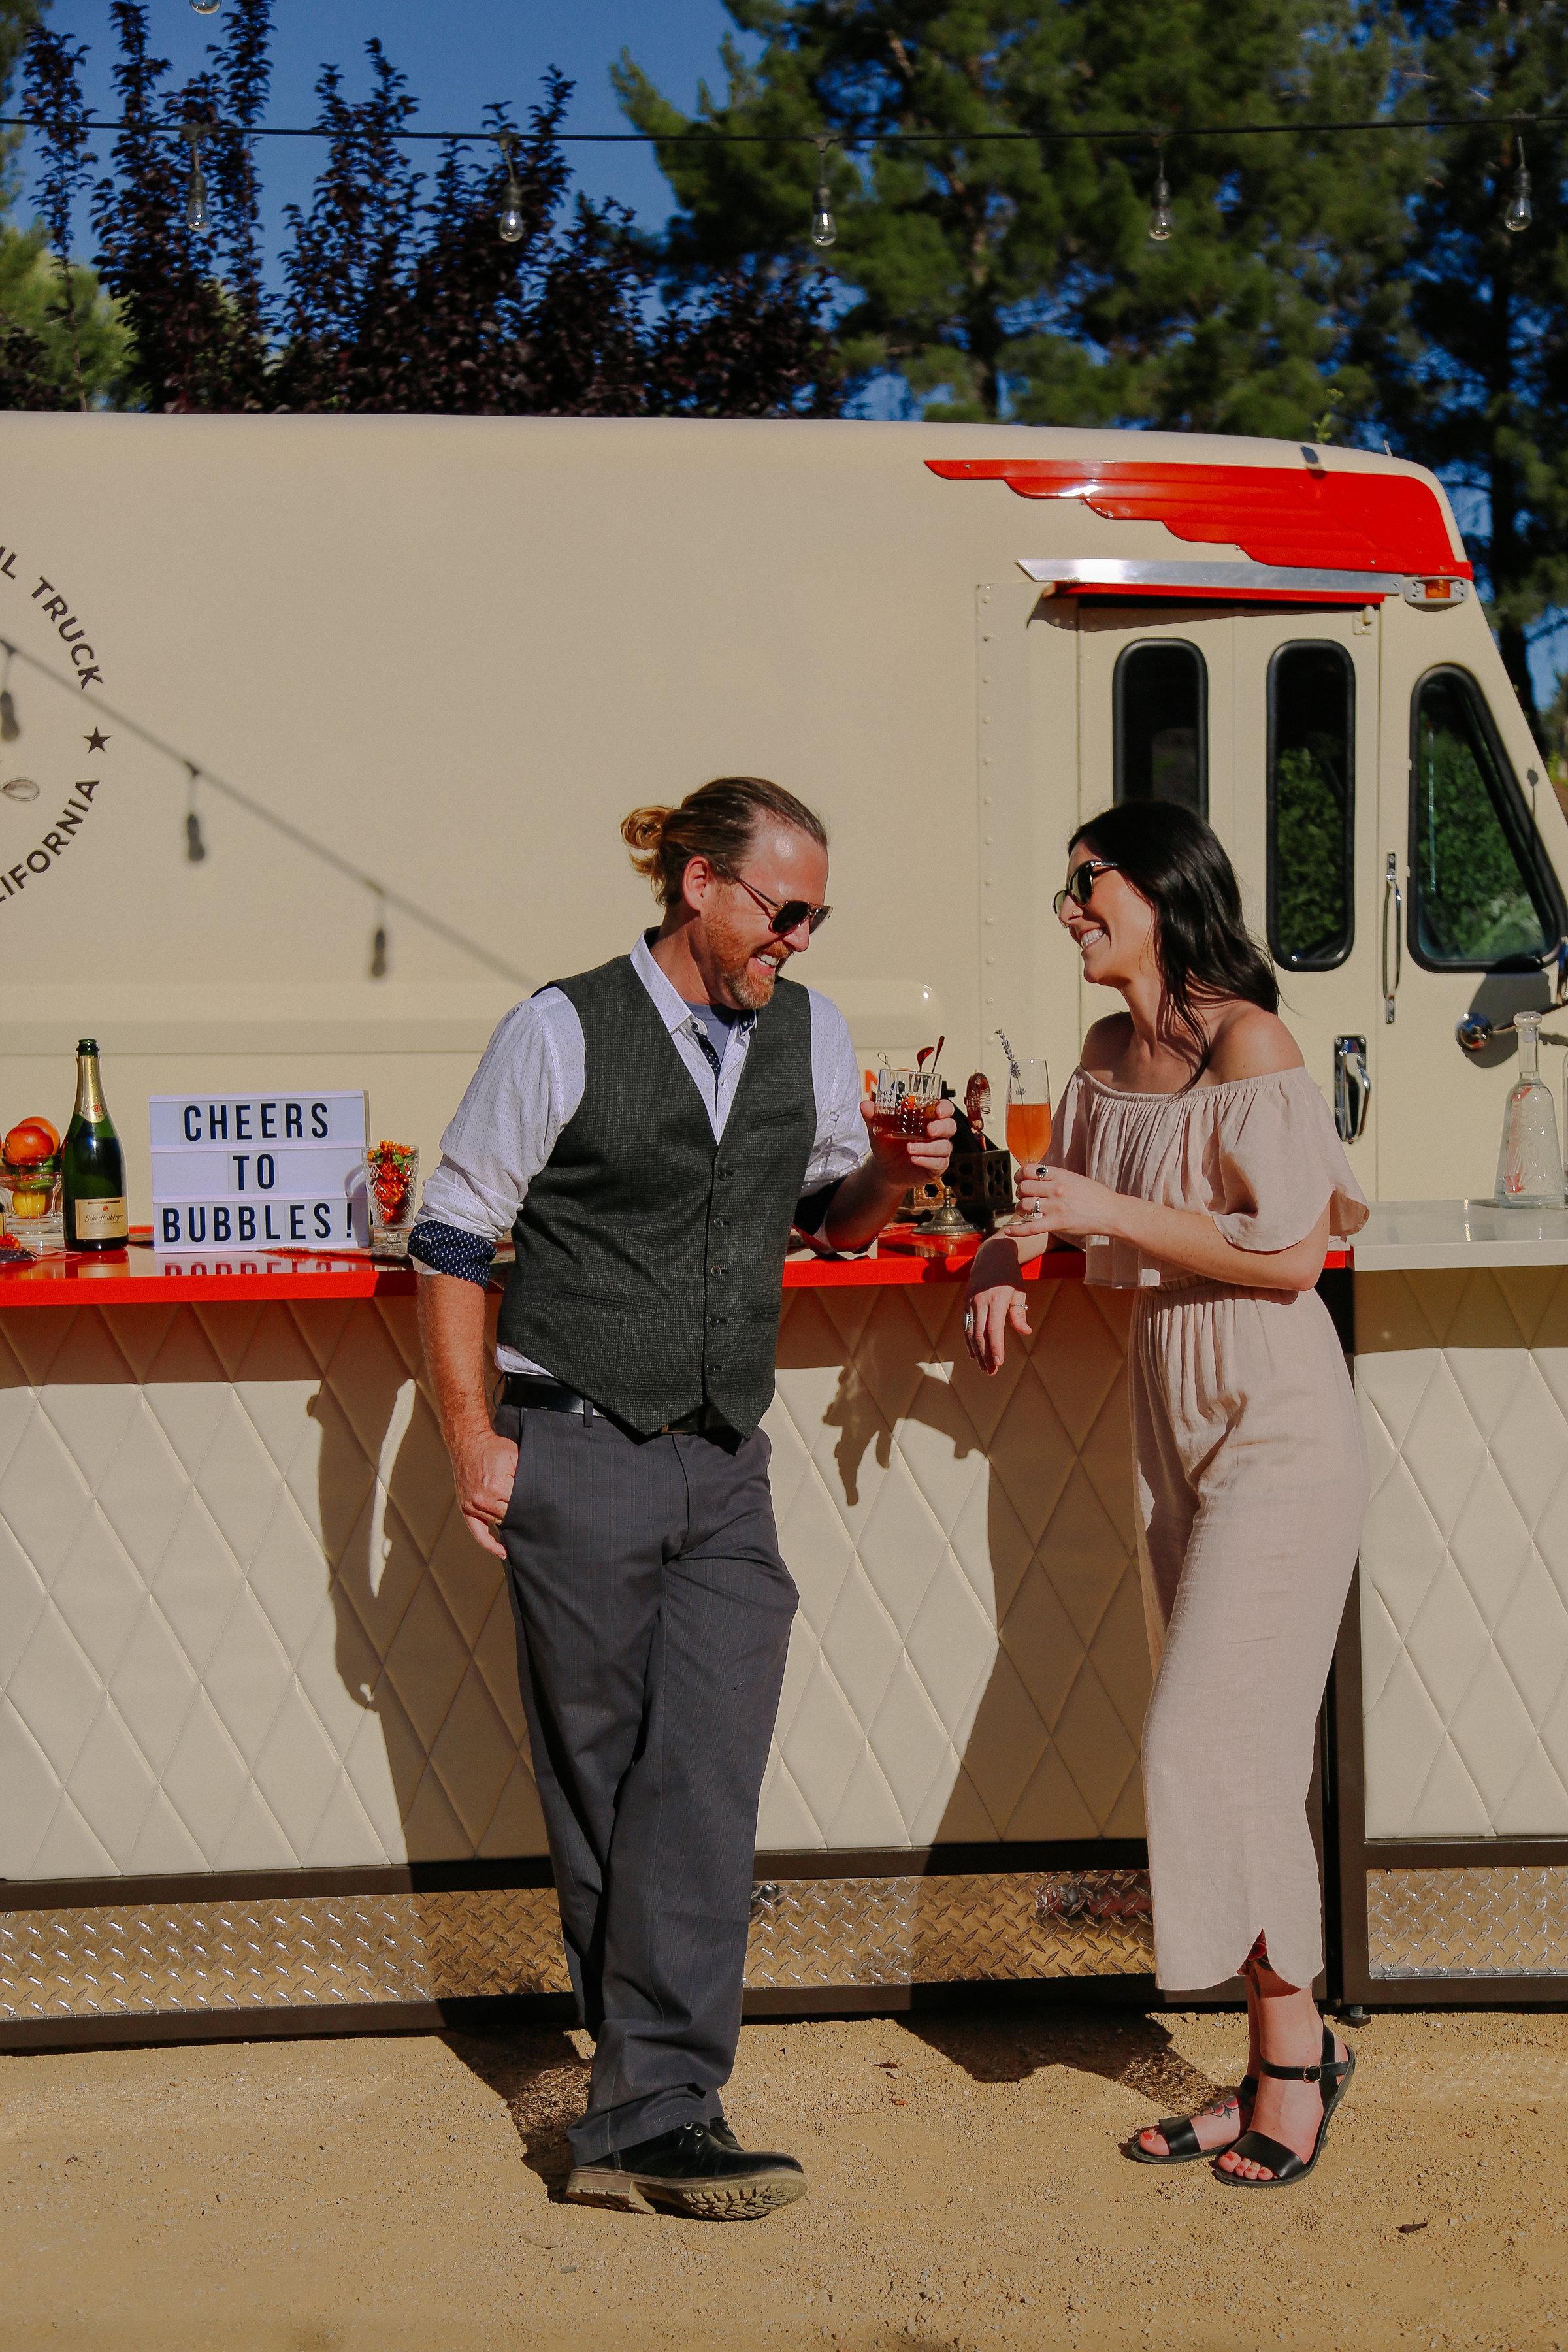 the-hatch-cocktail-truck-kendra-aronson-228.jpg